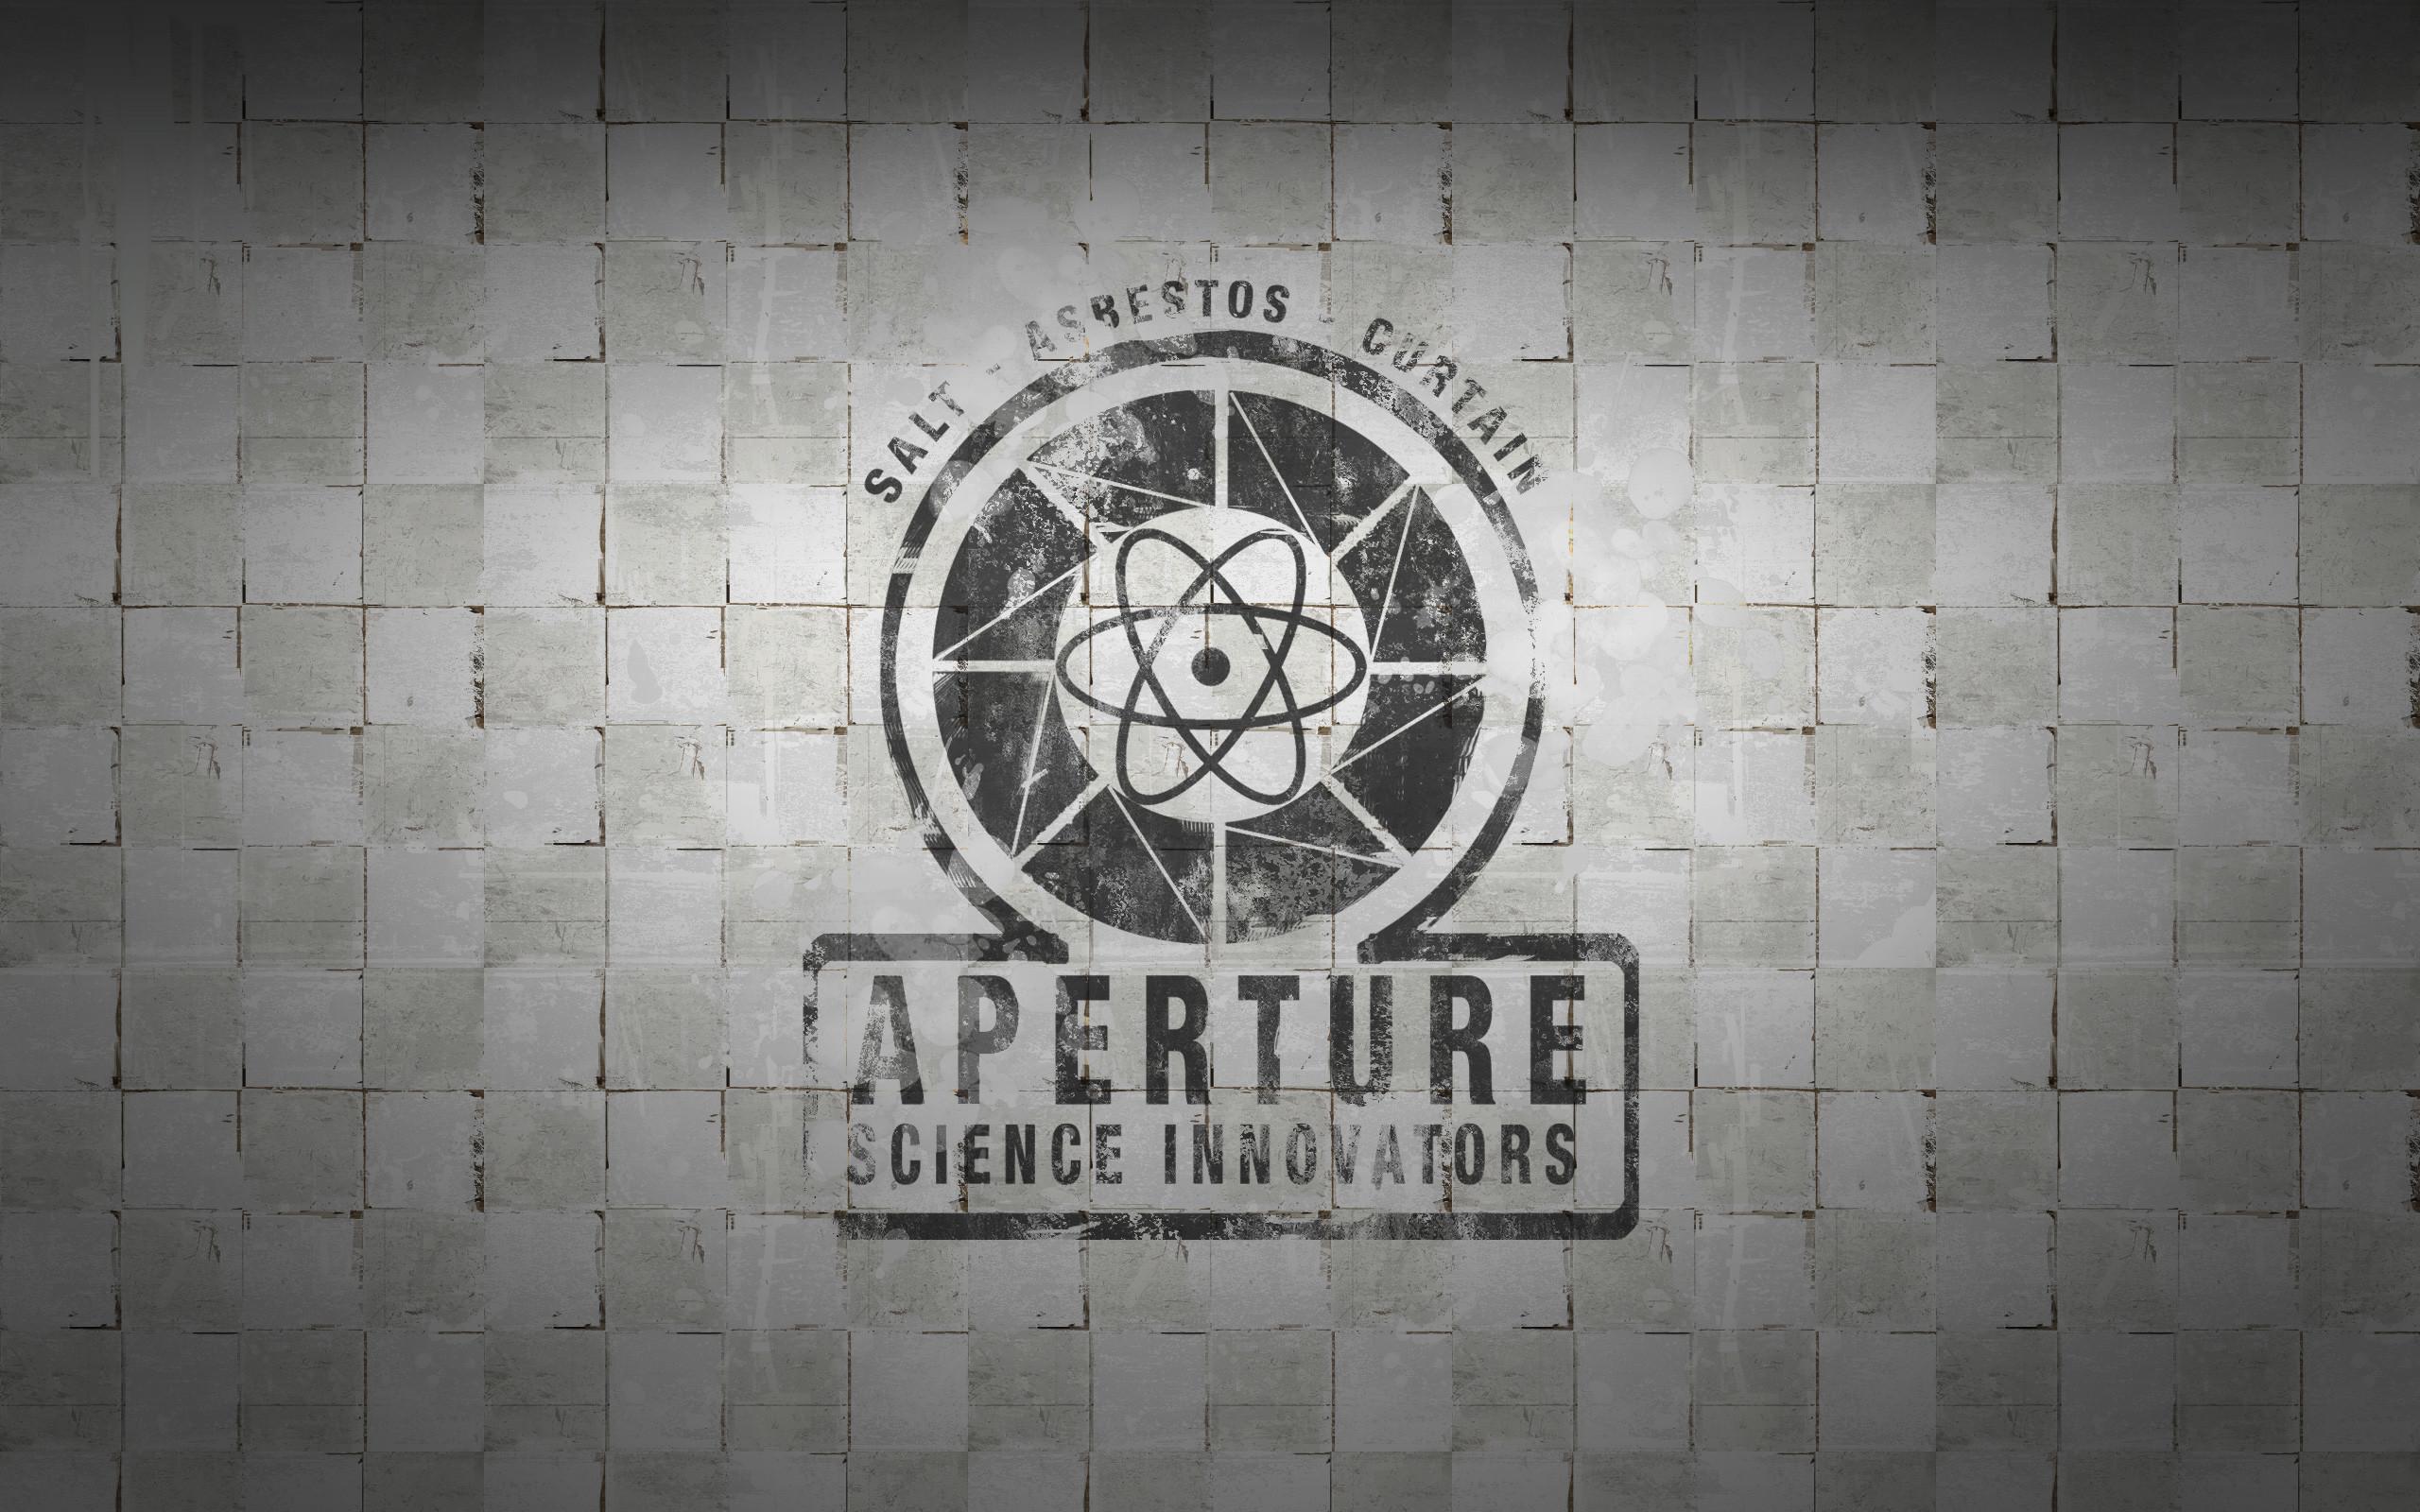 aperture-science-innovators-wood-wall.jpg2015-11-29 01:141.2 MB …